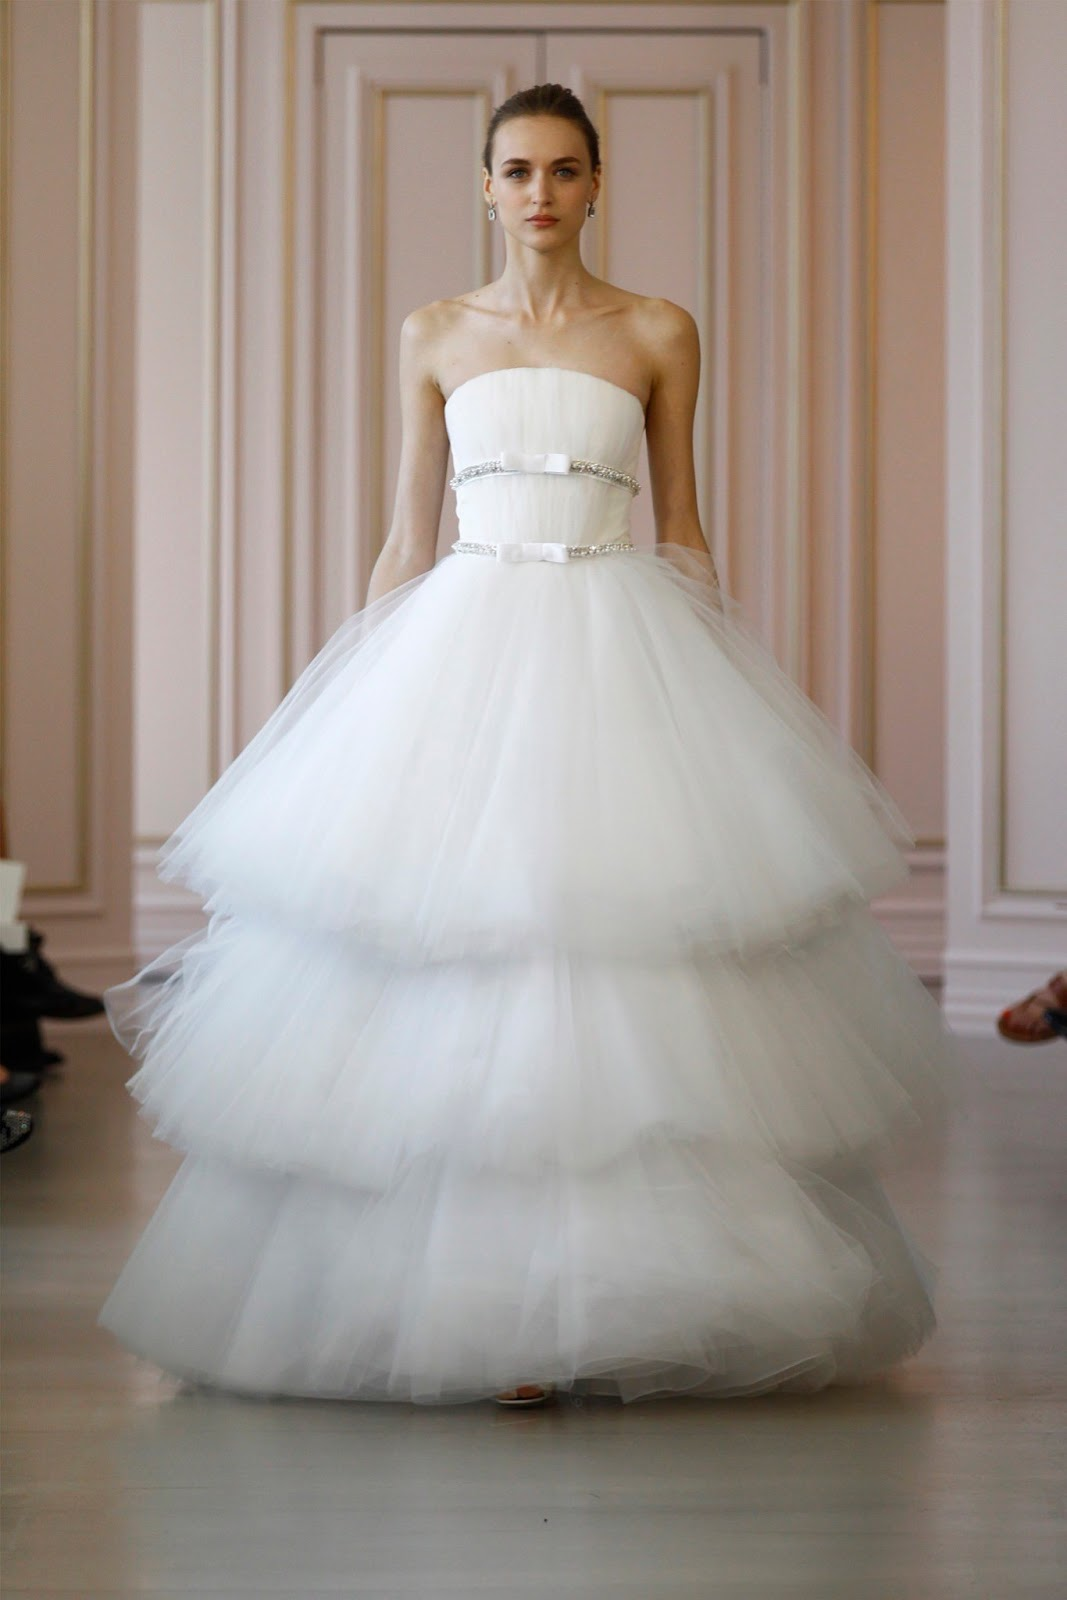 Bridal Wear | New Bridal Dresses For Spring Brides 2016 By Oscar De ...